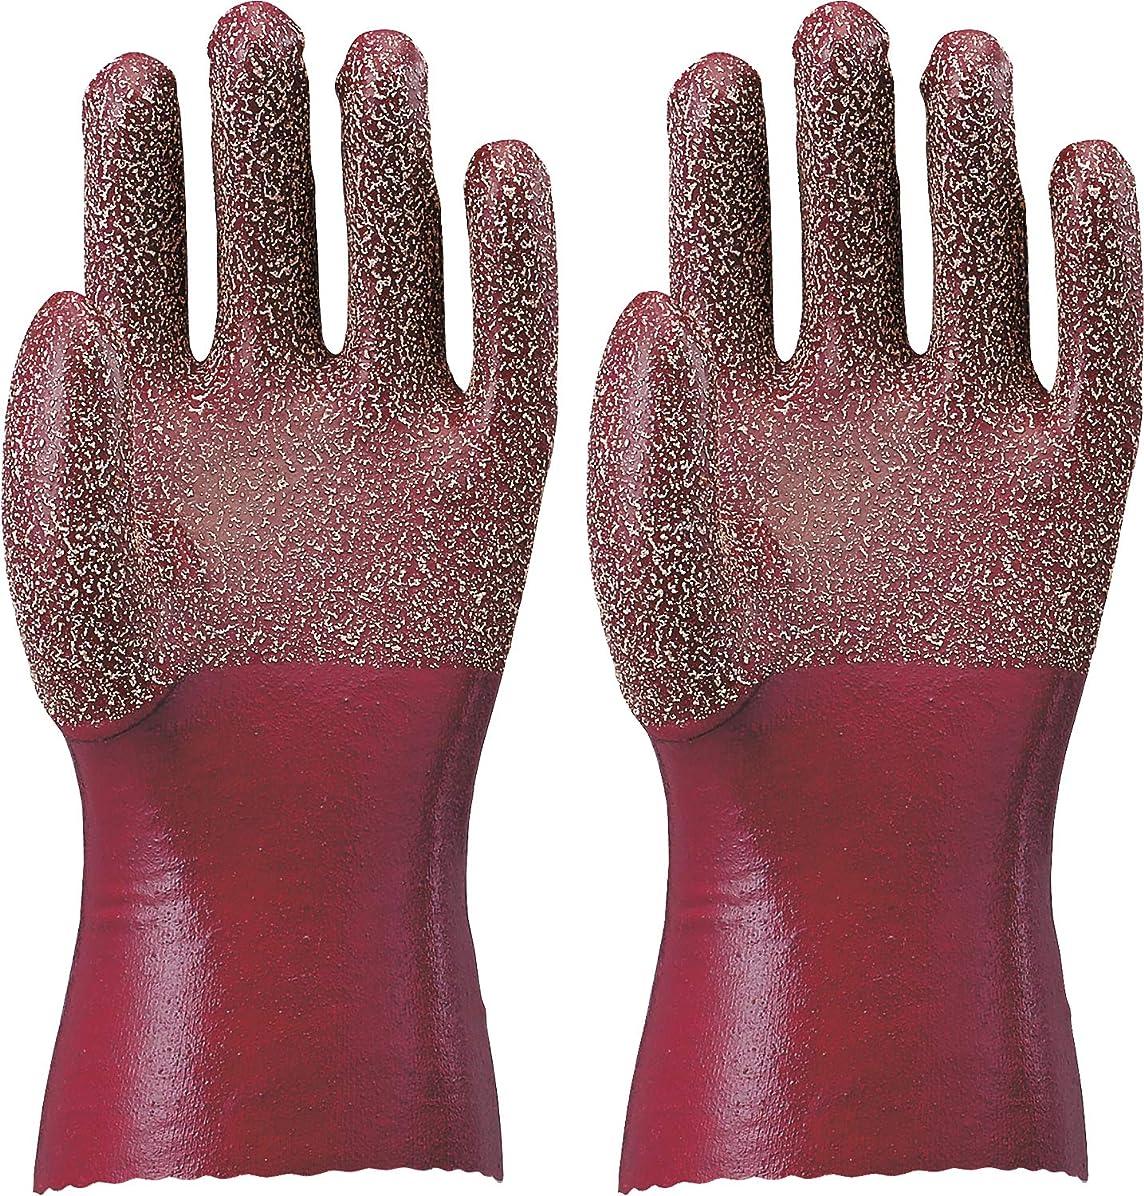 ATOM 裏生地付手袋 天然ゴム作業手袋 Mサイズ 1211